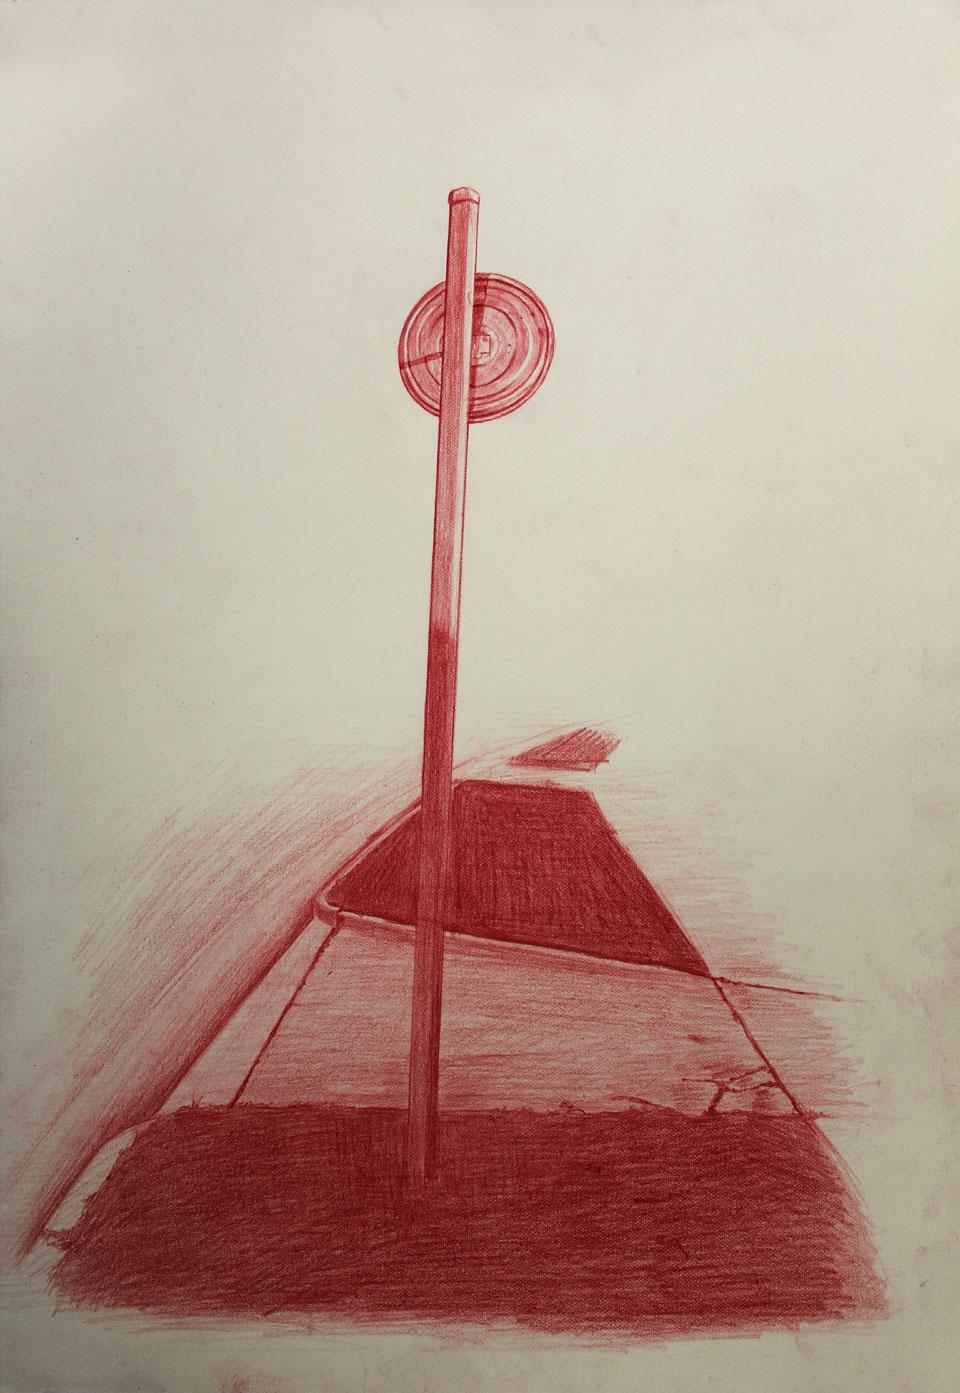 Vin Ryan,  Sign, Sunshine (6) , 2012, pencil on paper, 38 x 28cm